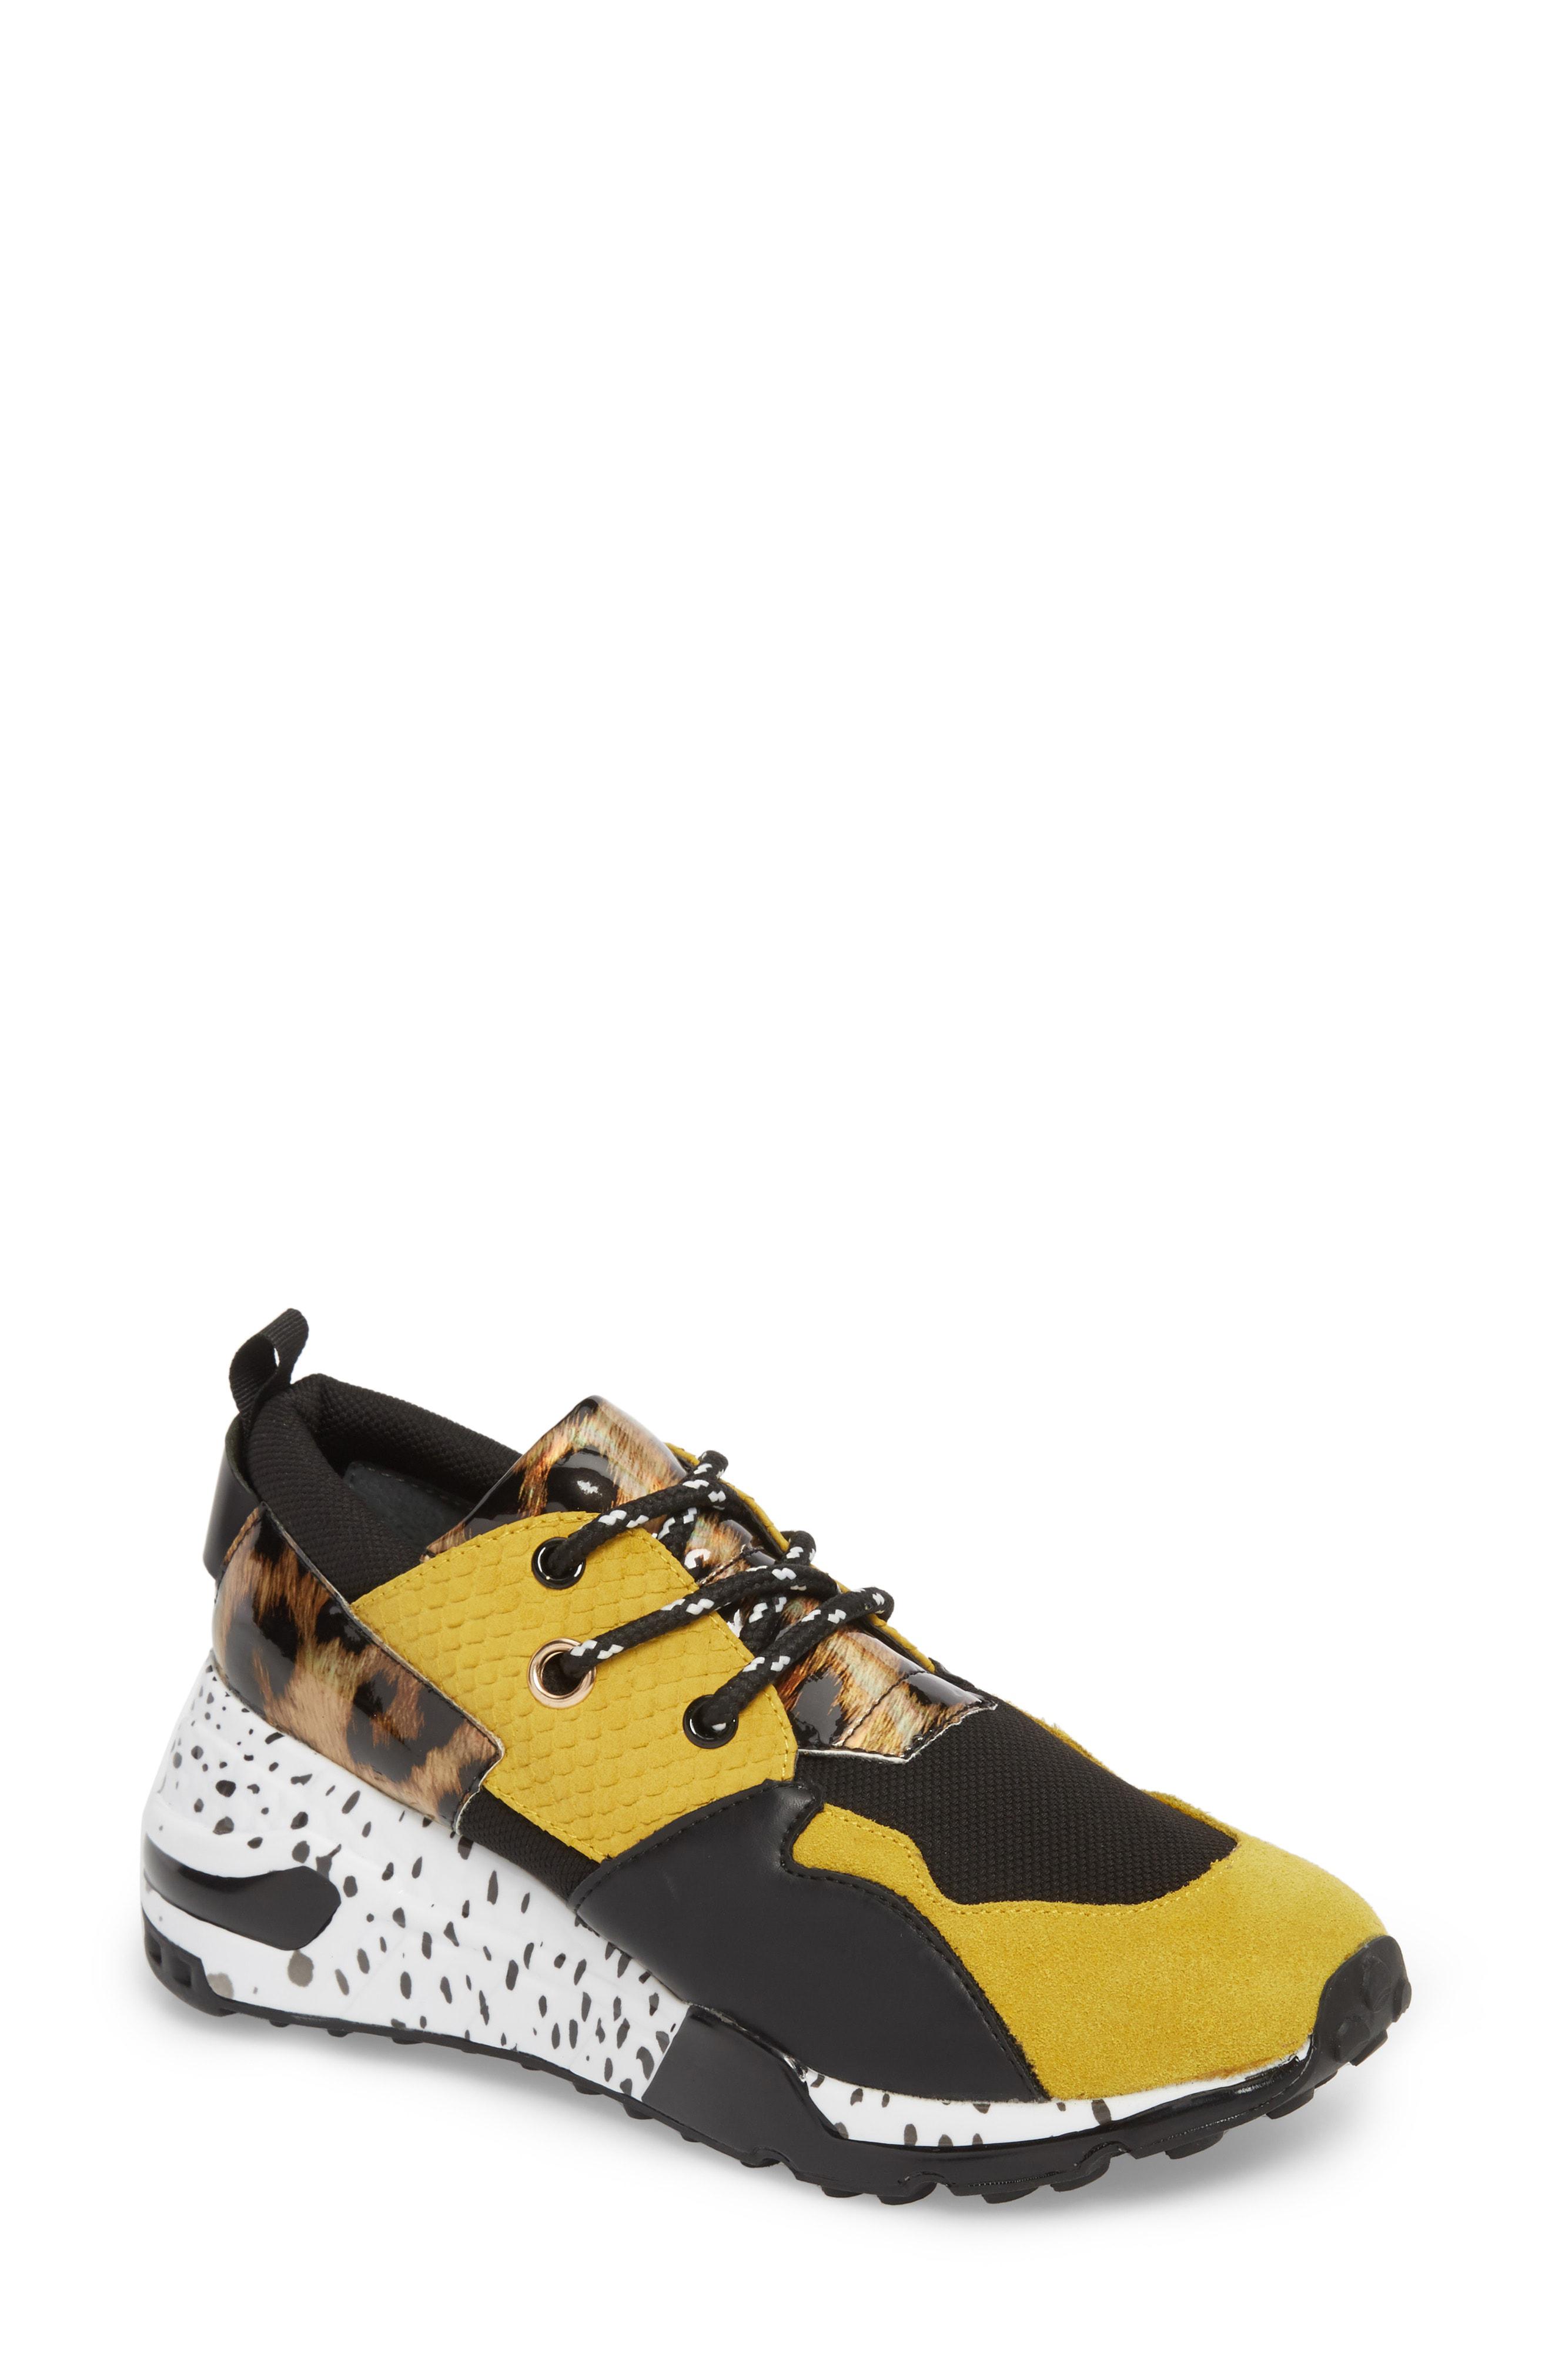 bb8eb0cccd7 Steve Madden Cliff Sneaker In Yellow Multi